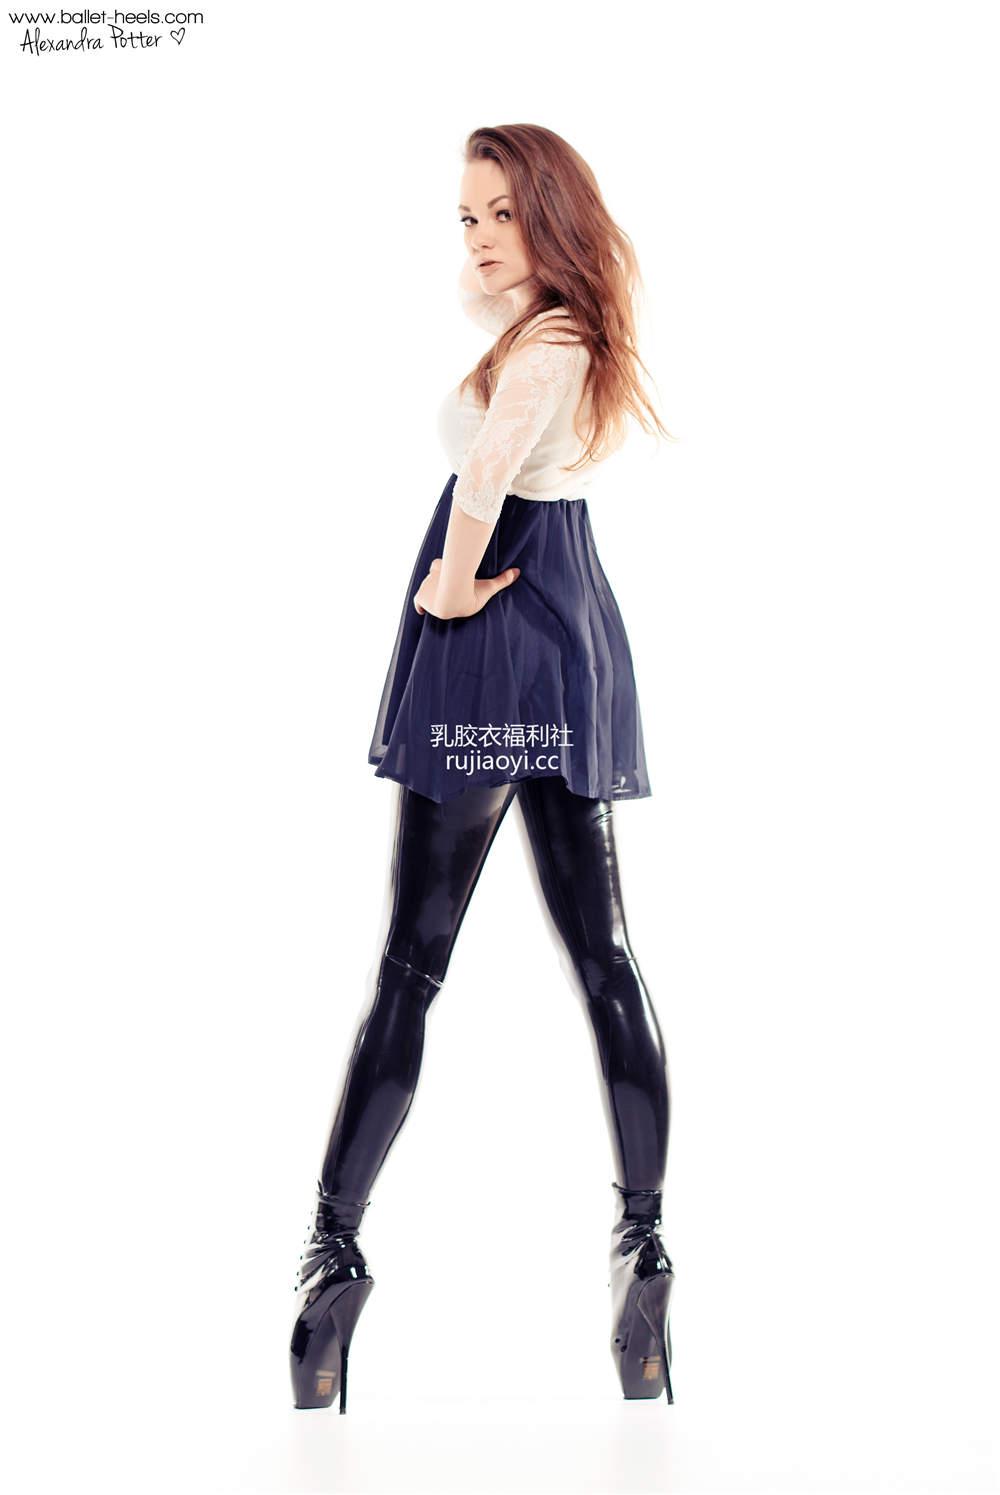 [Ballet-Heels] 乳胶皮裤勾勒完美身段 [57P61M]